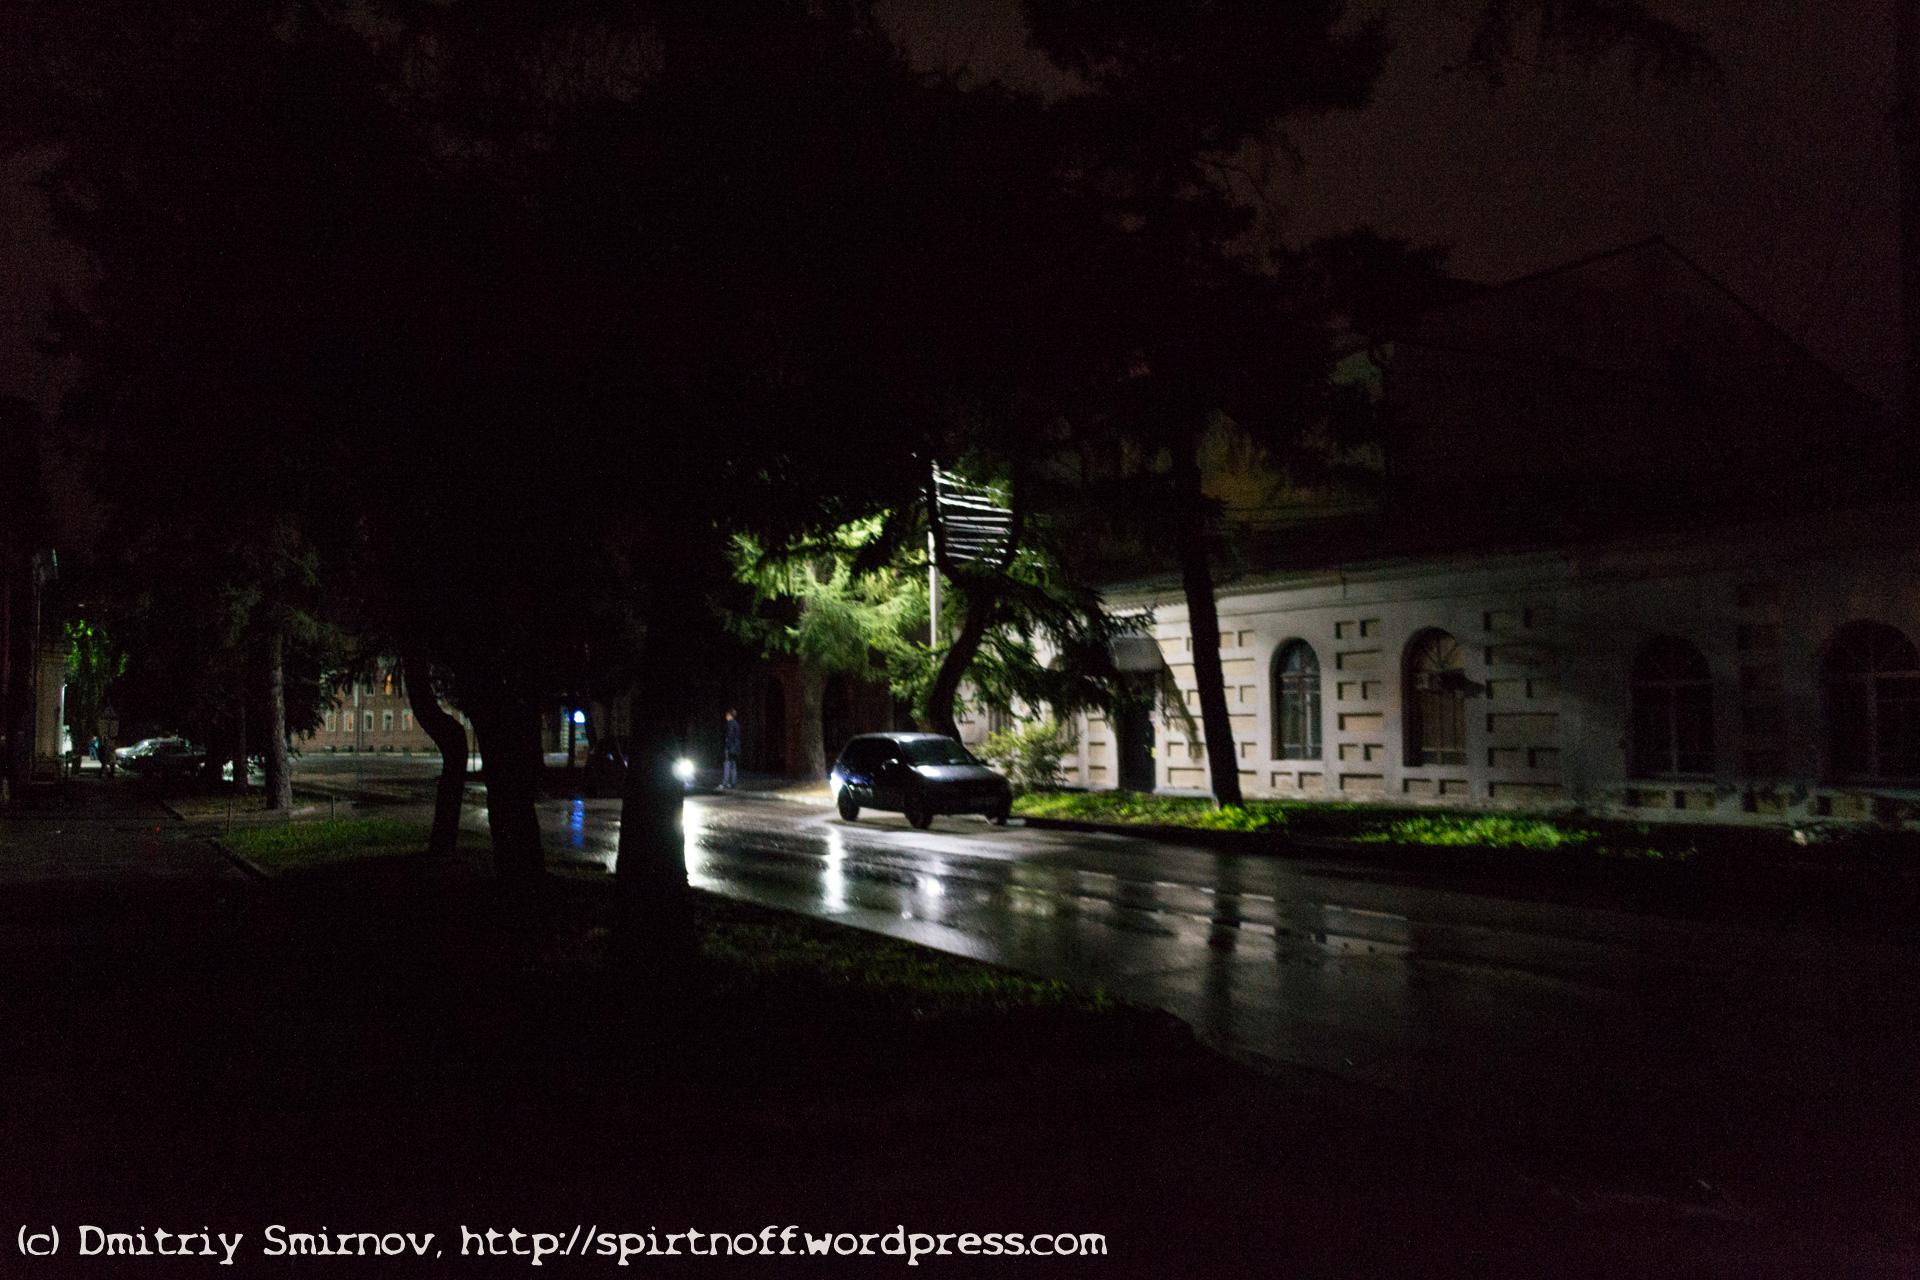 blog-37-of-59 Путешествия  Рязань. Город темных фонарей